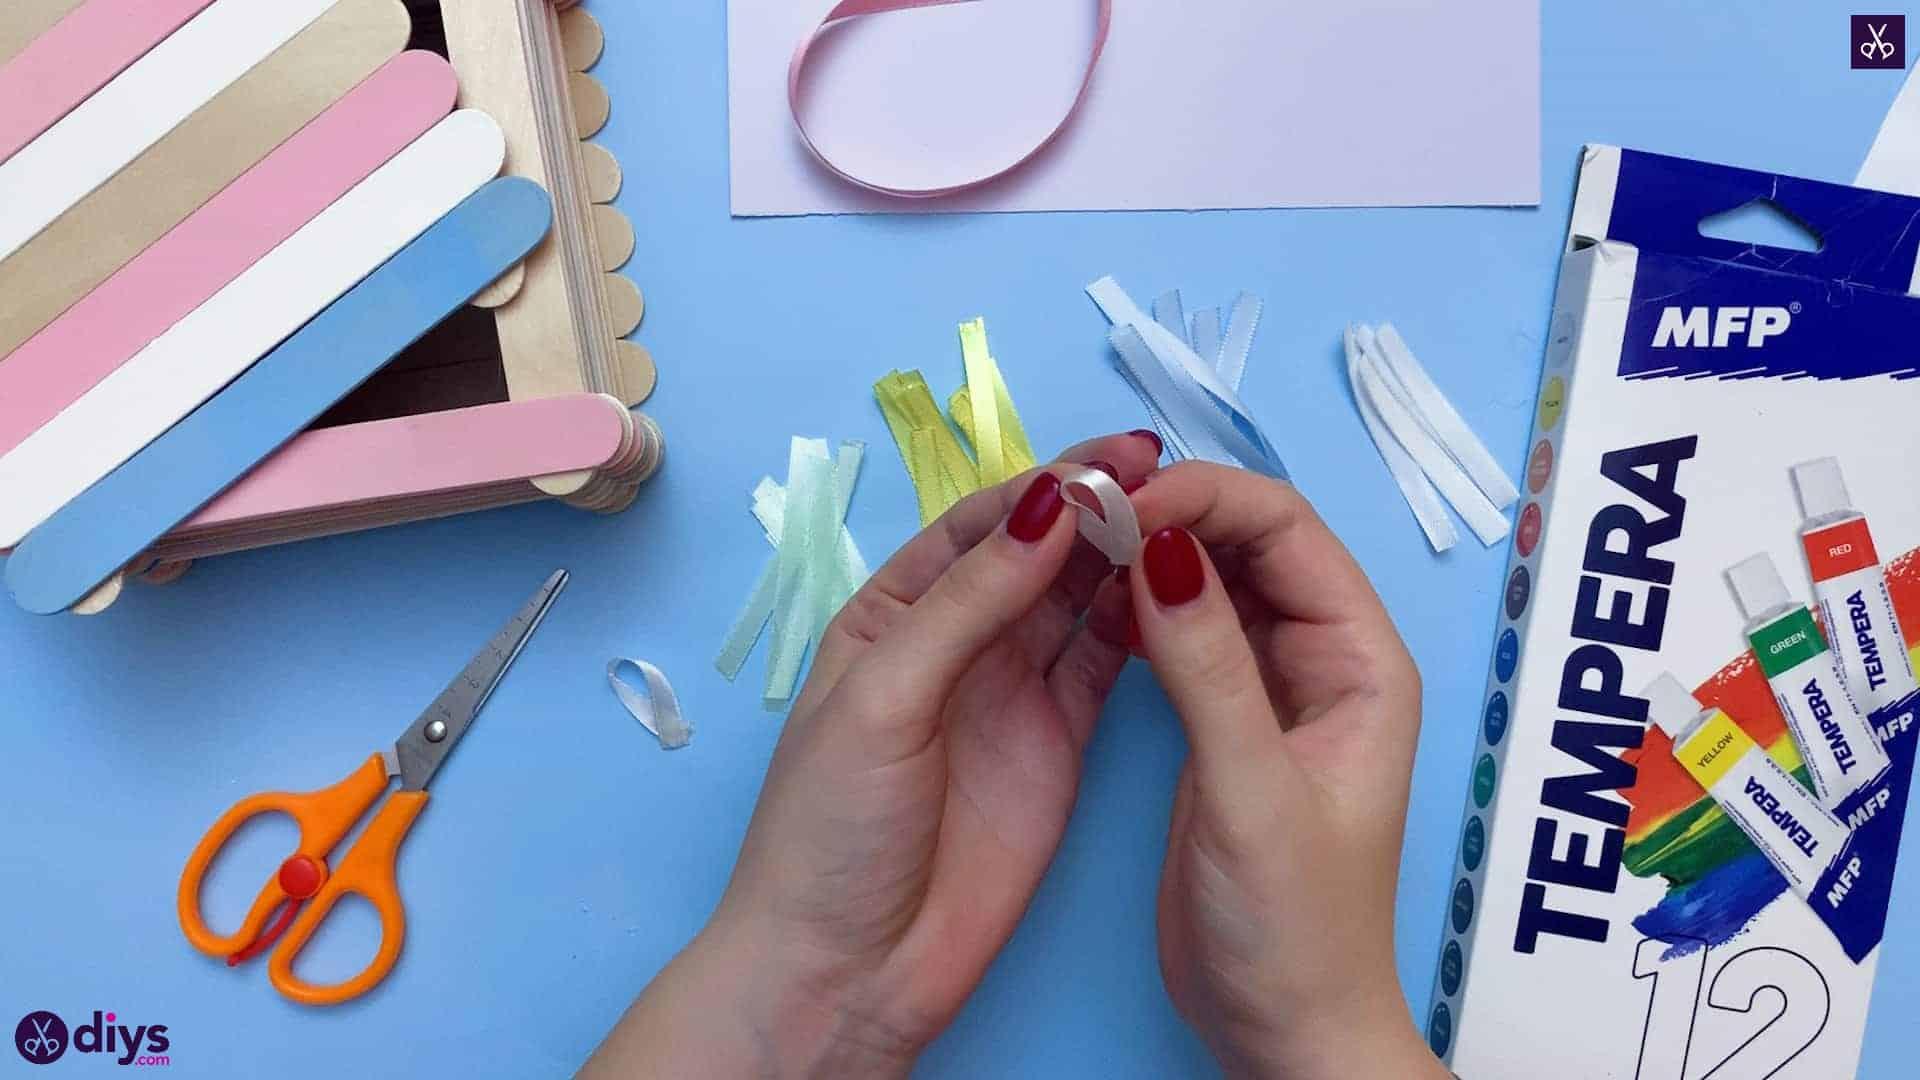 Diy popsicle stick jewelry box step 8